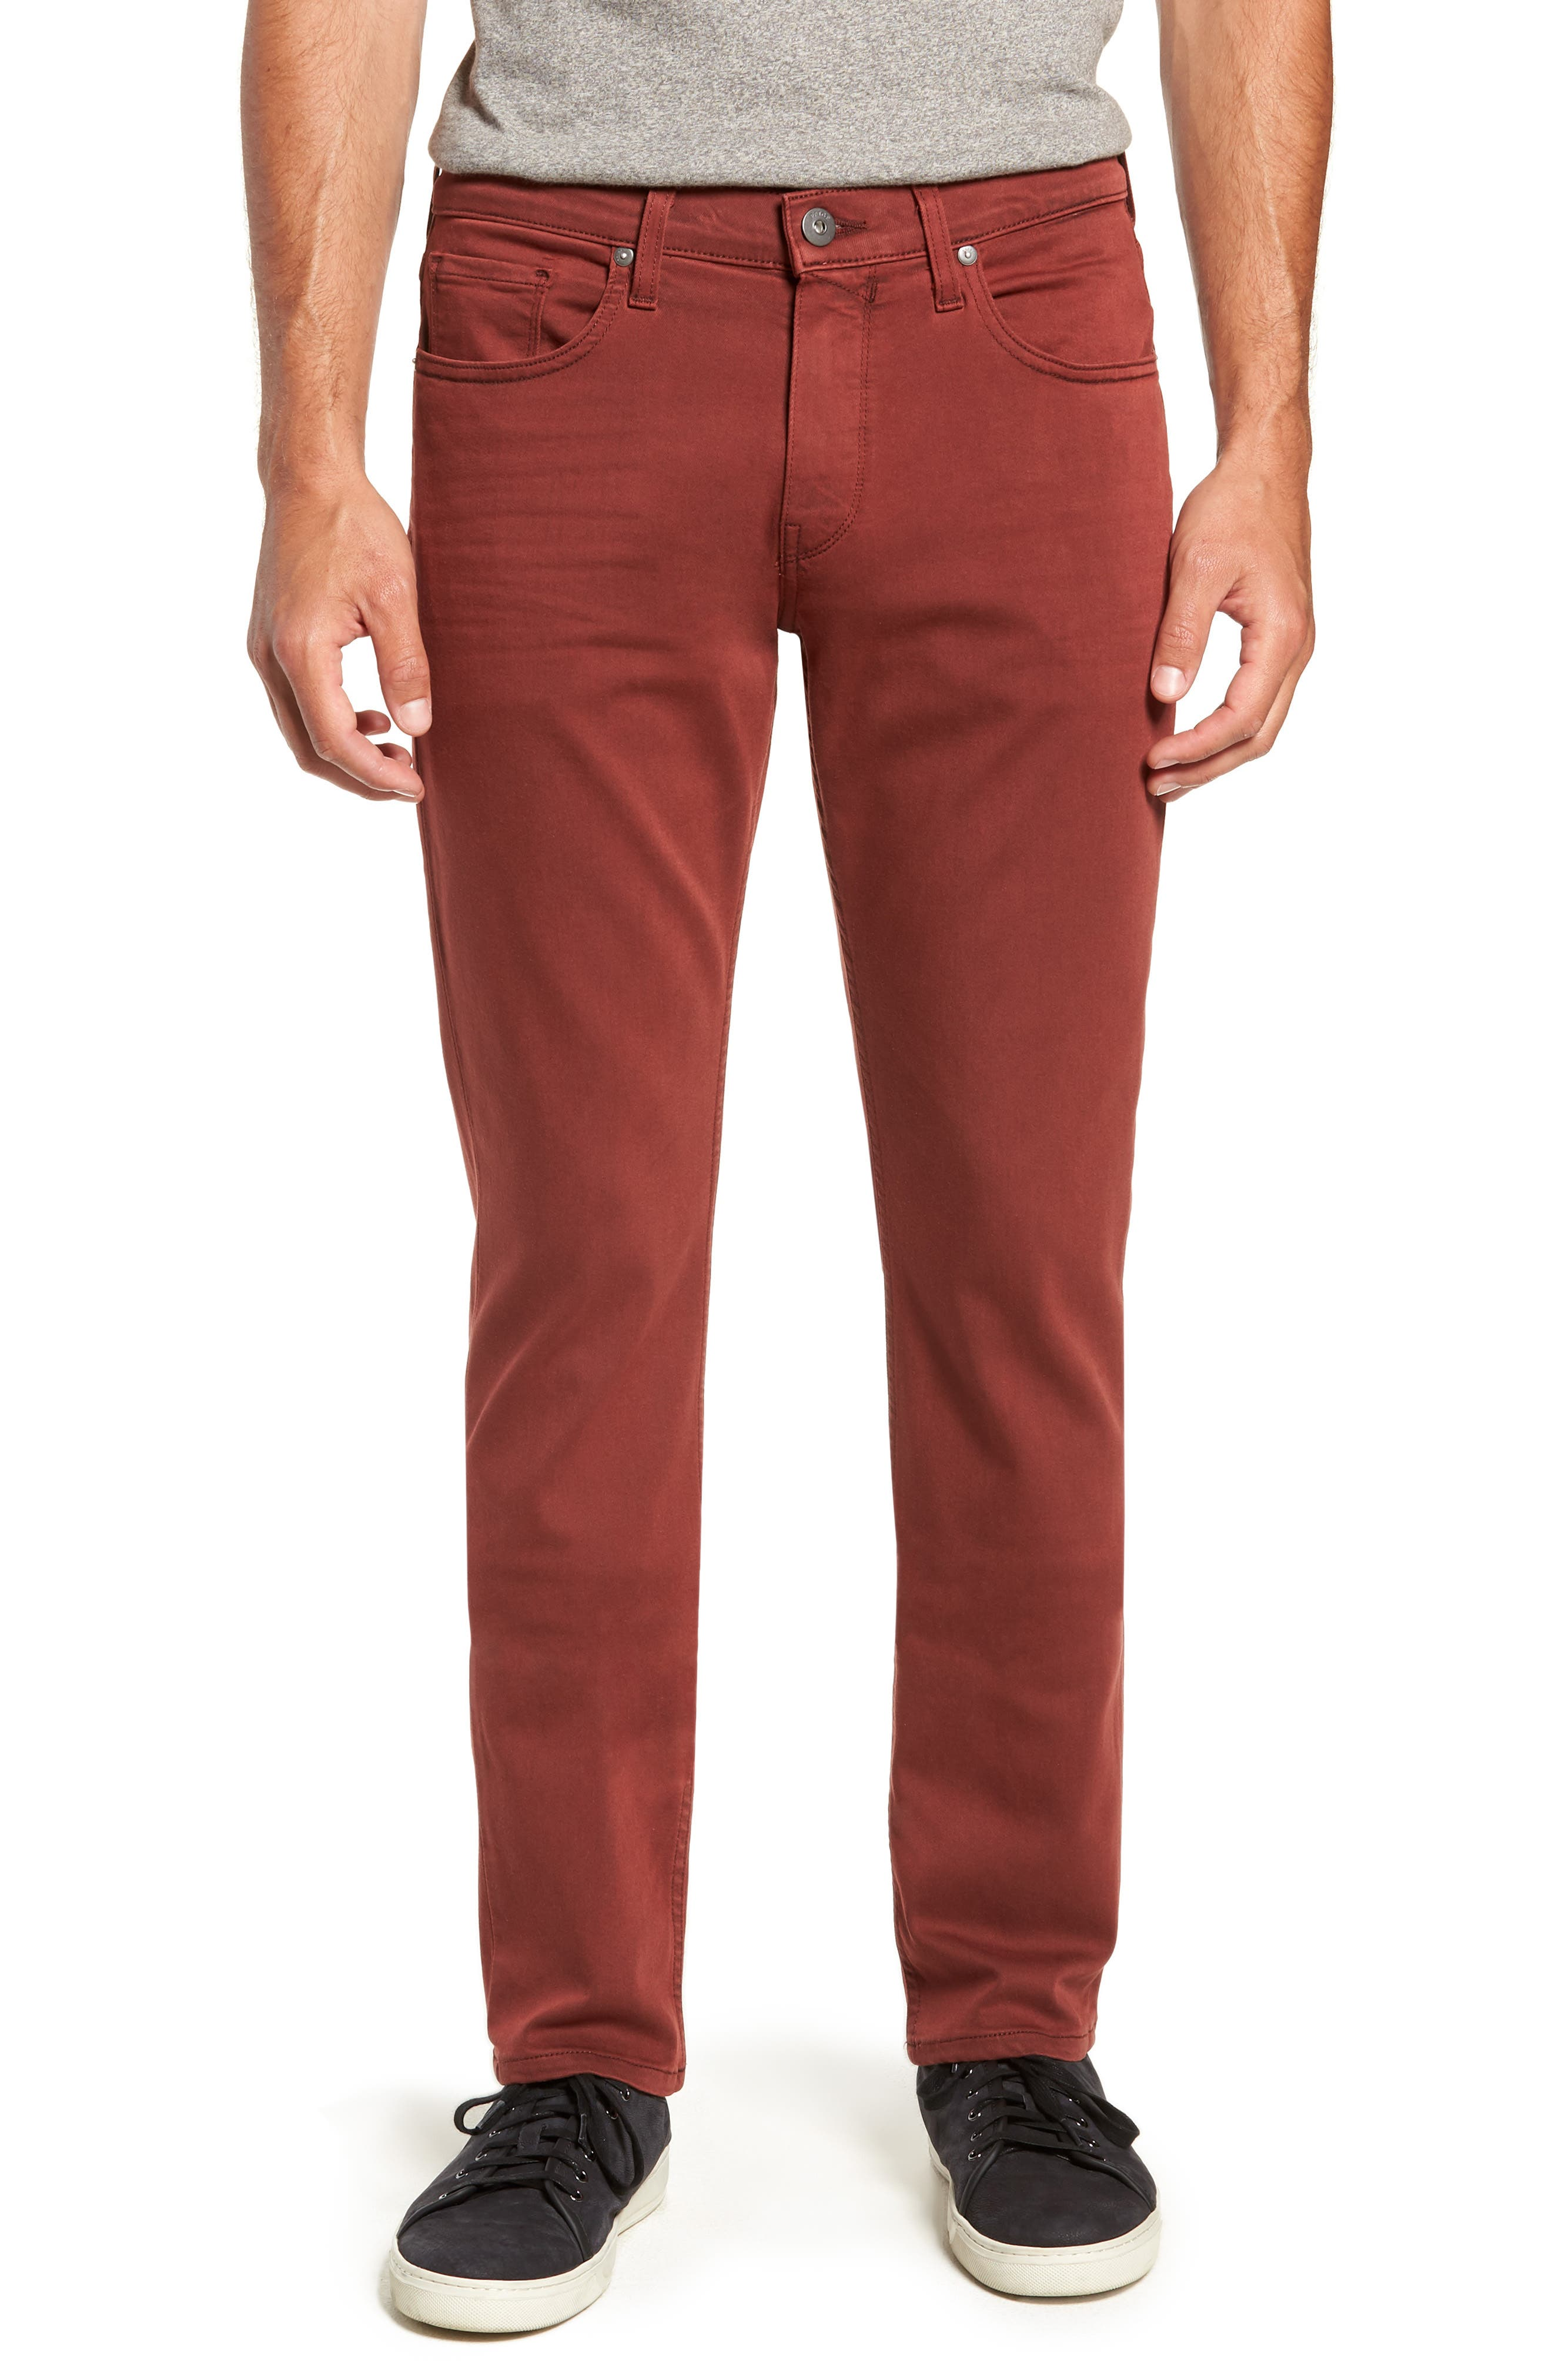 Transcend - Federal Slim Straight Leg Jeans,                             Main thumbnail 1, color,                             VINTAGE PERSIMMON